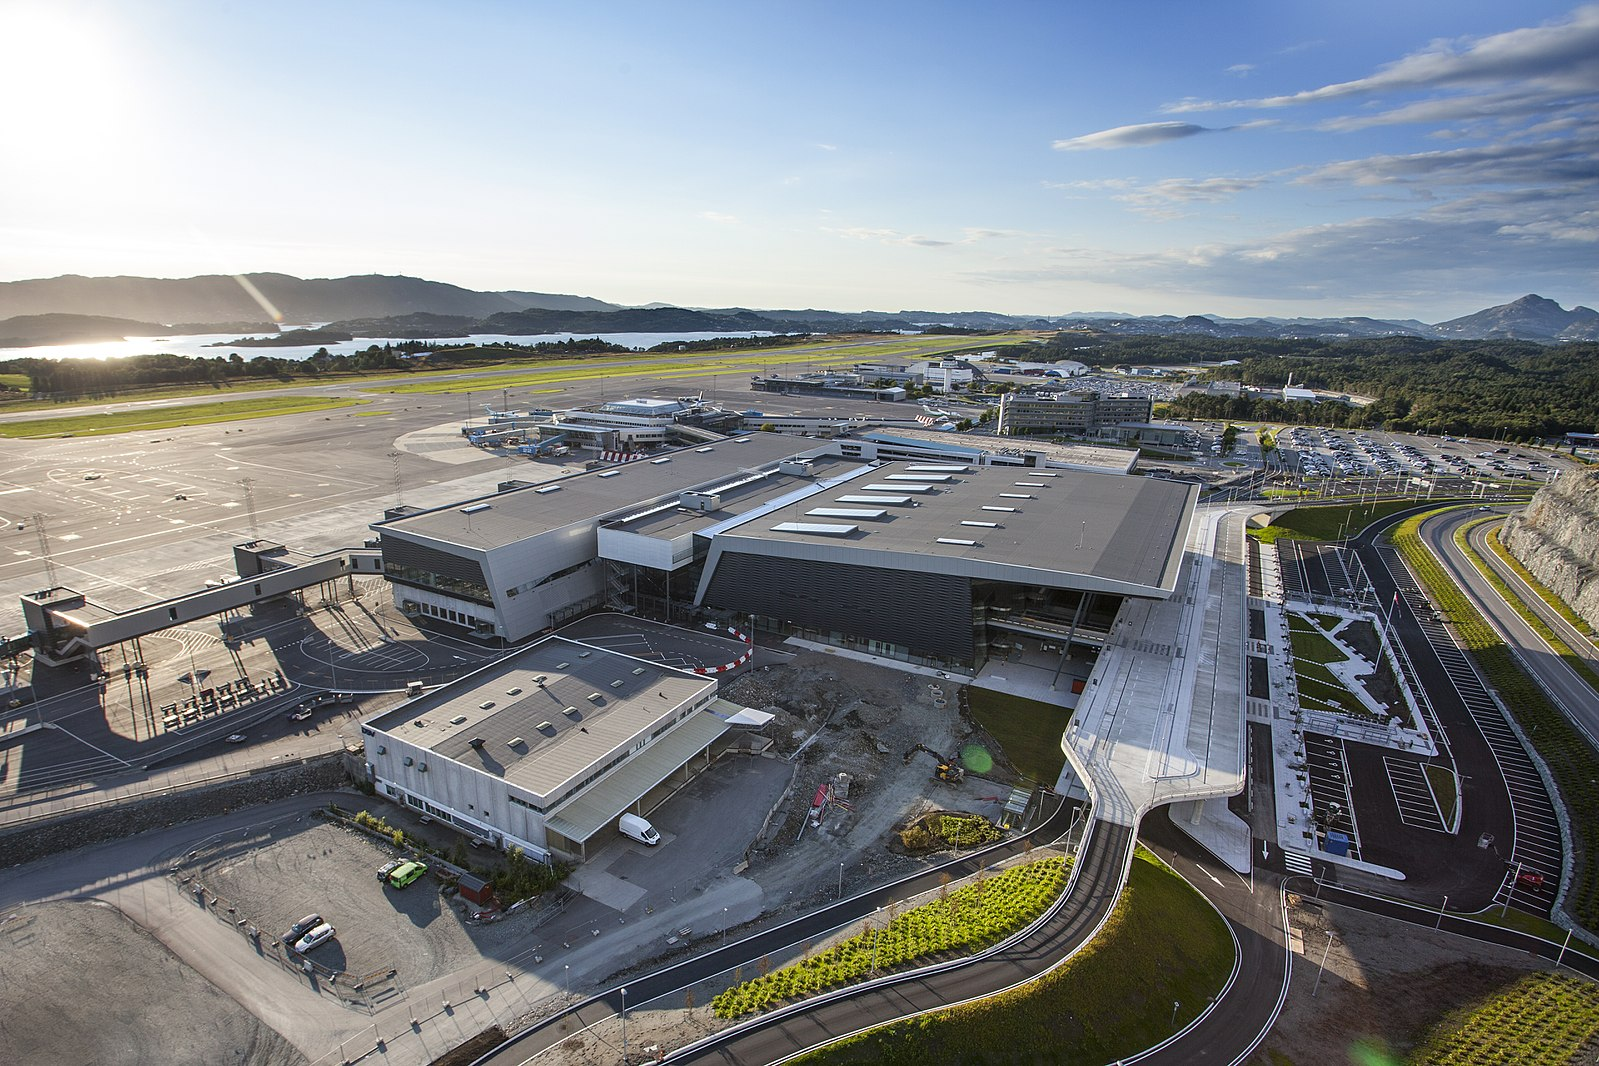 bergen airport terminal map Bergen Airport Bgo bergen airport terminal map